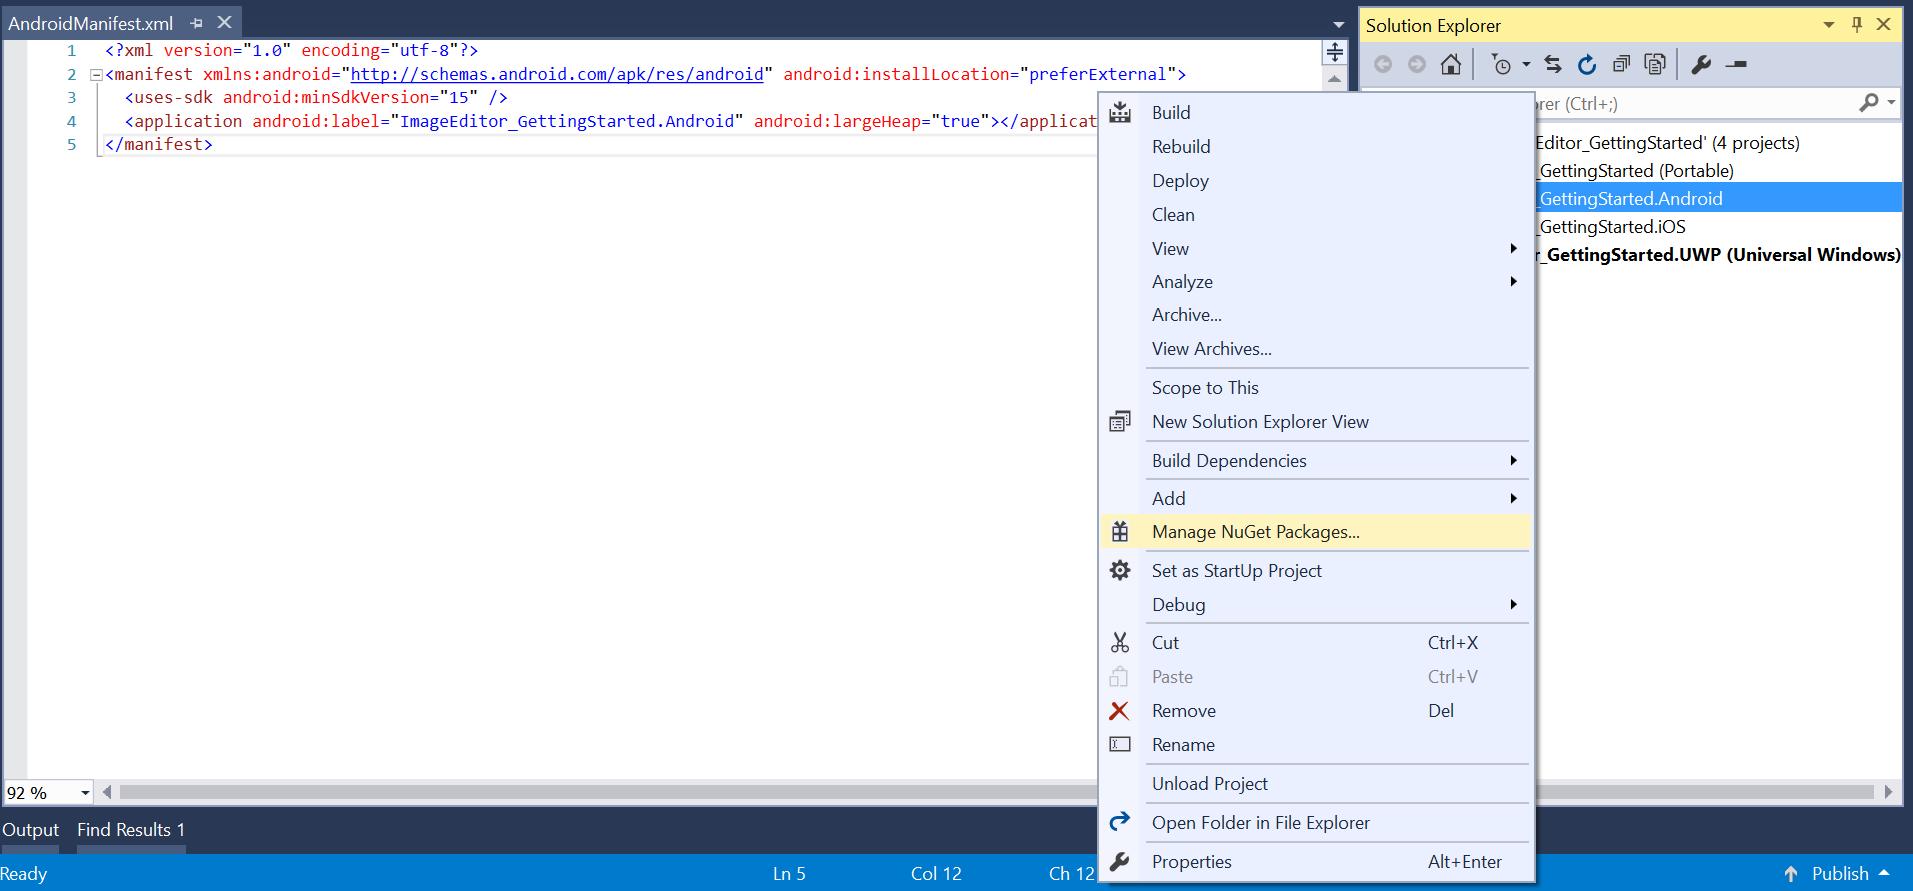 C:\Users\samkumar.arivazhagan\AppData\Local\Microsoft\Windows\INetCache\Content.Word\Manifest.png